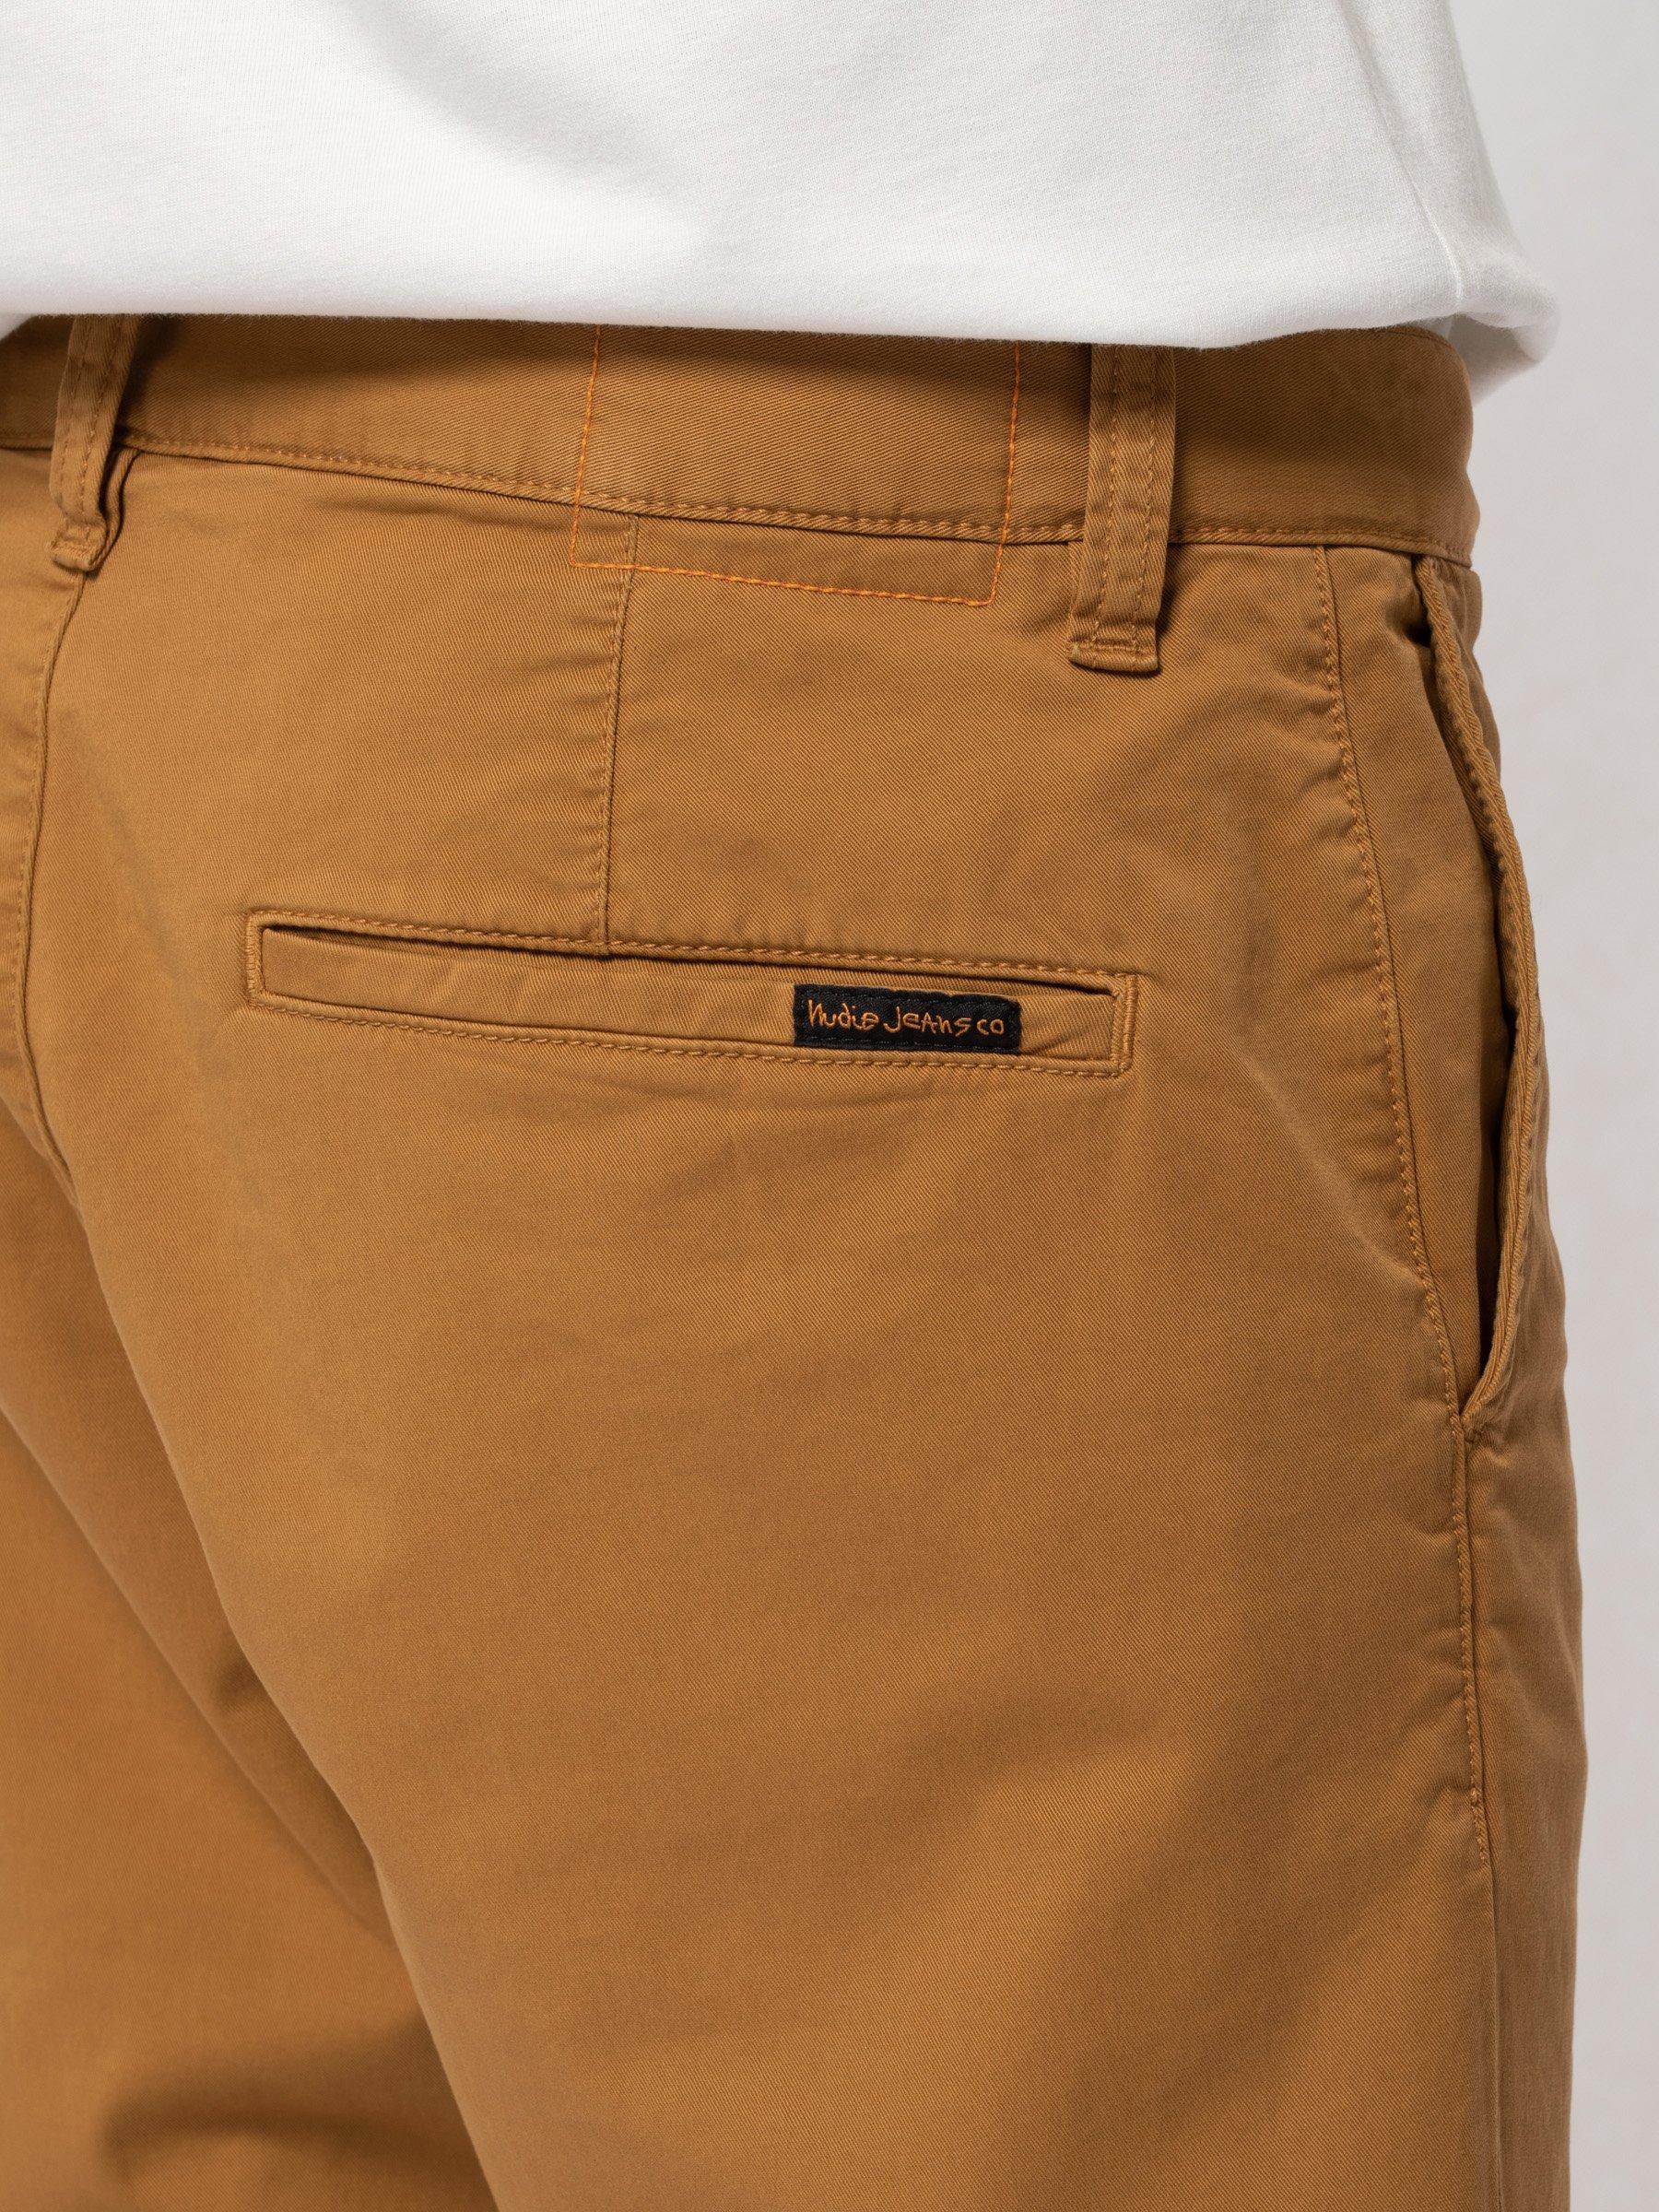 mespromenades-le-pantalon-dautmne-nudie-jeans-Easy-Alvin-Camel-120168-16_irBdjk3_2400x2400